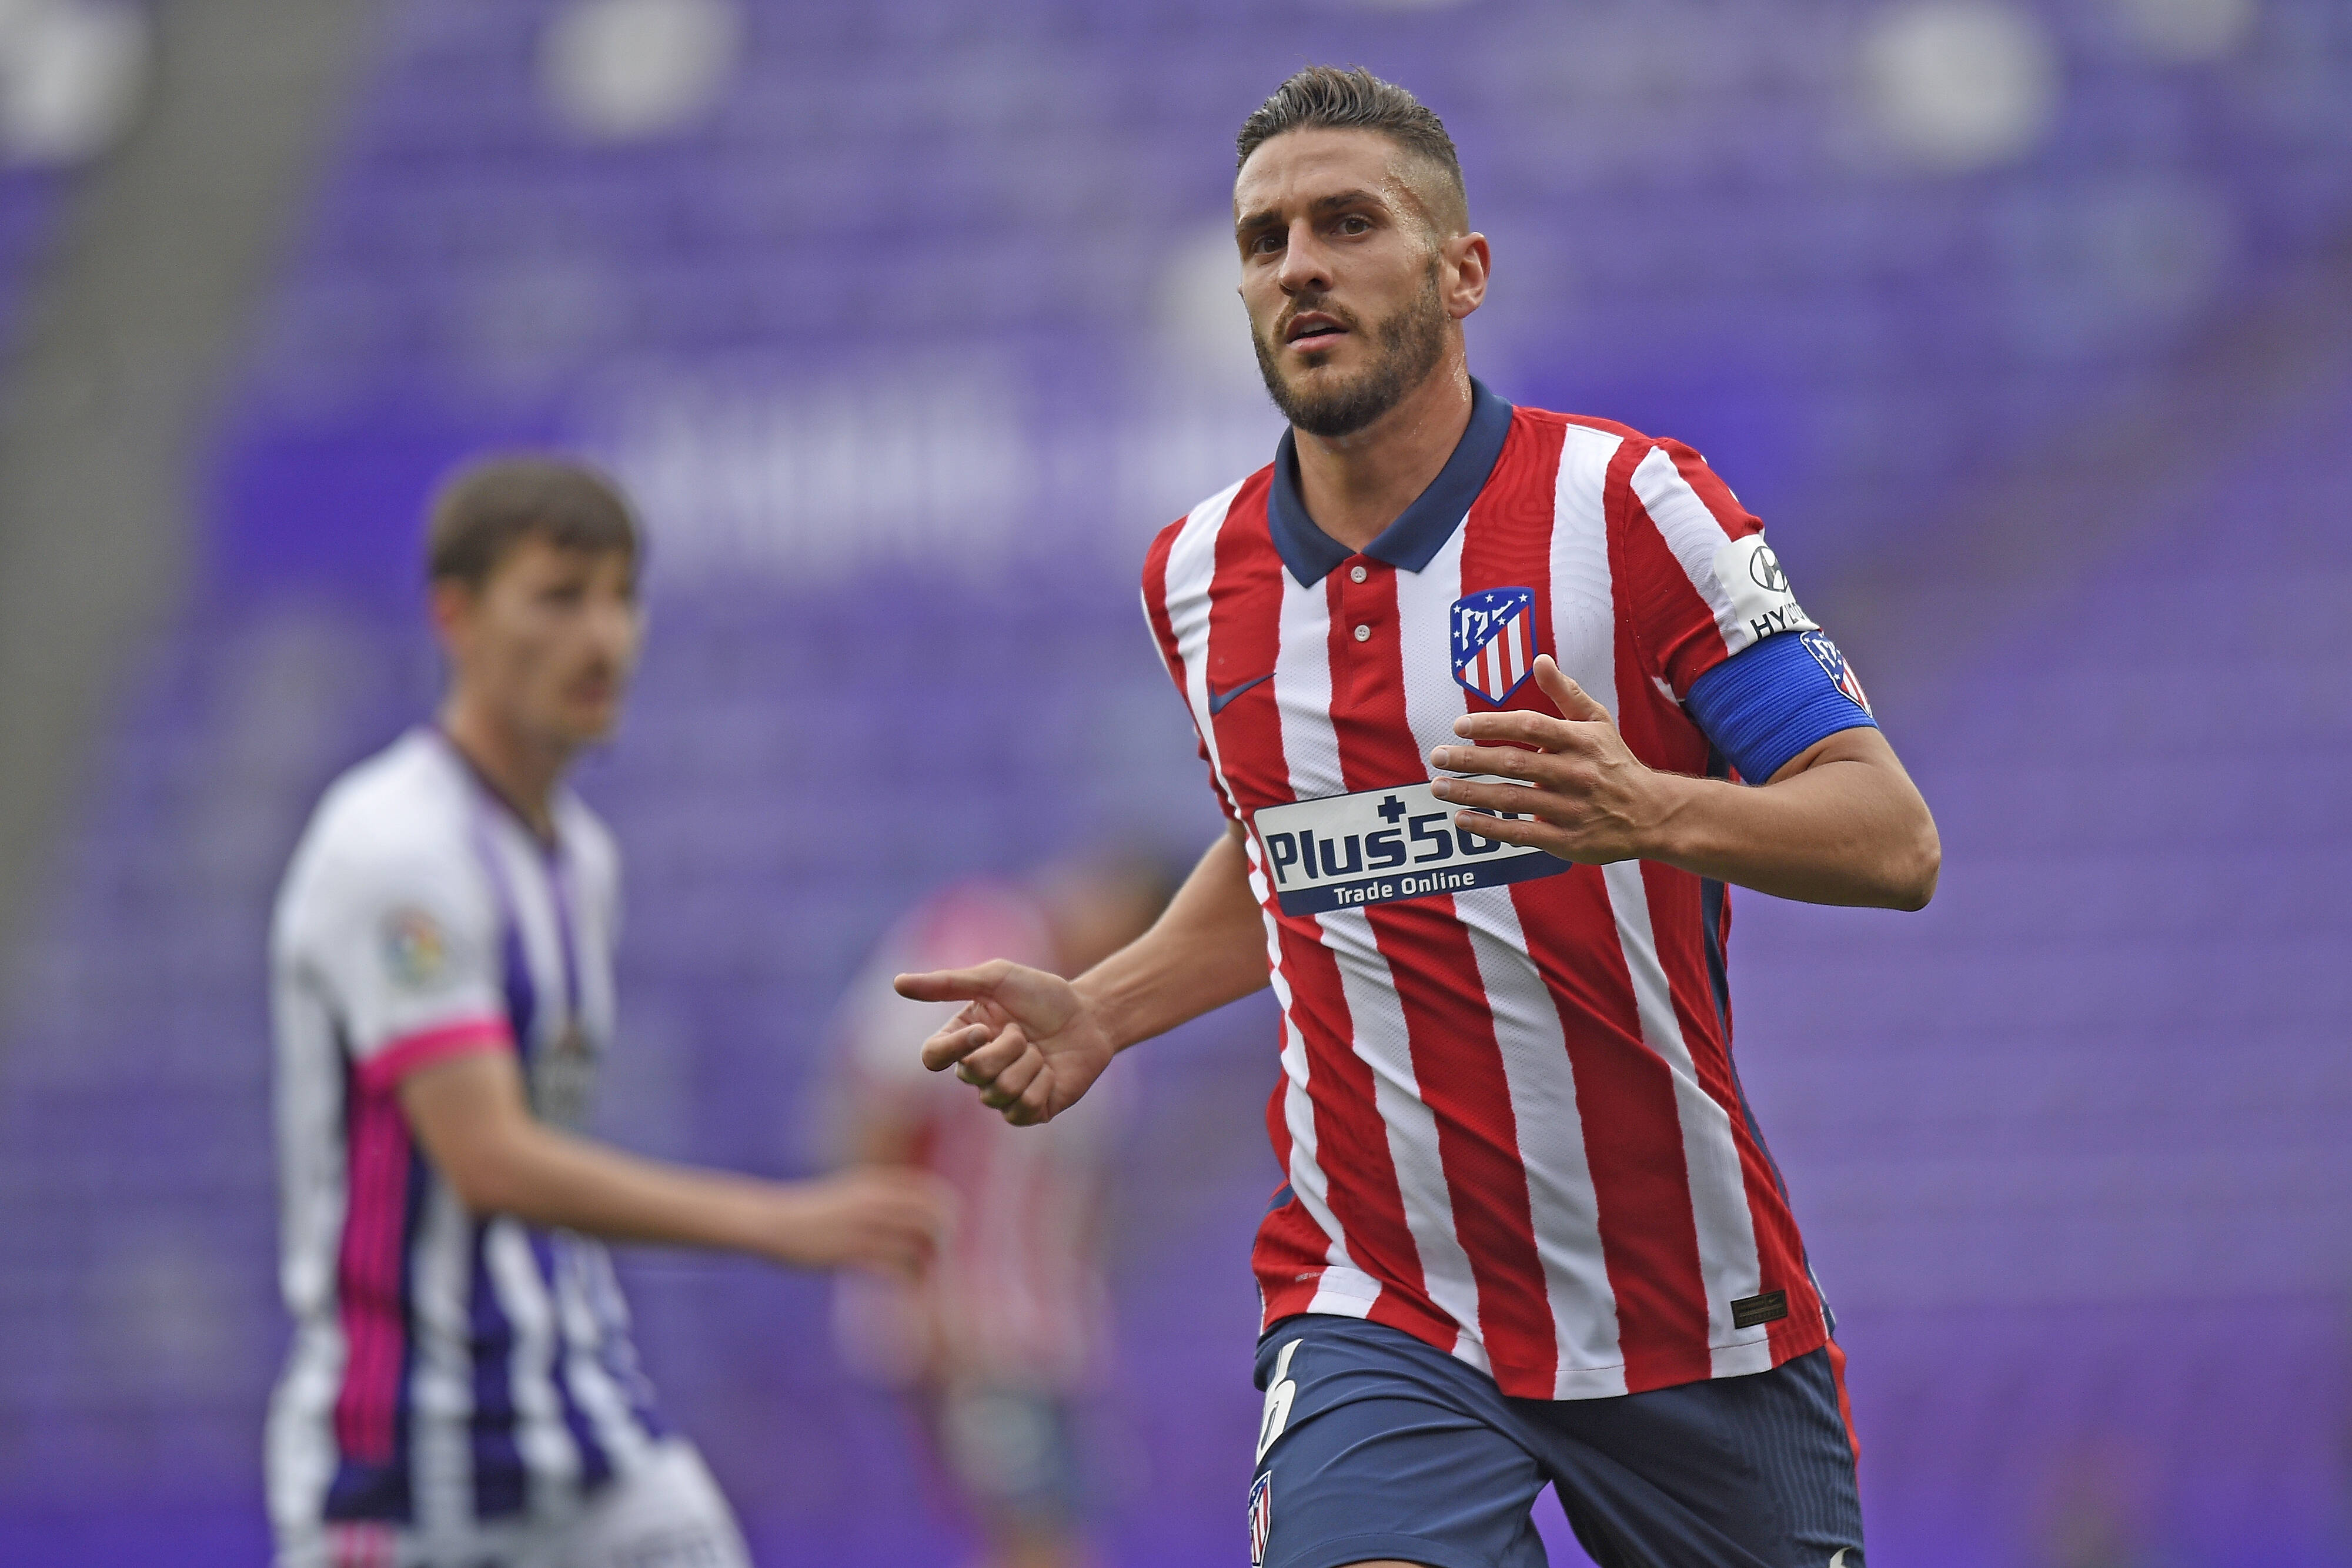 Atletico Madrid handed key preseason fitness boost